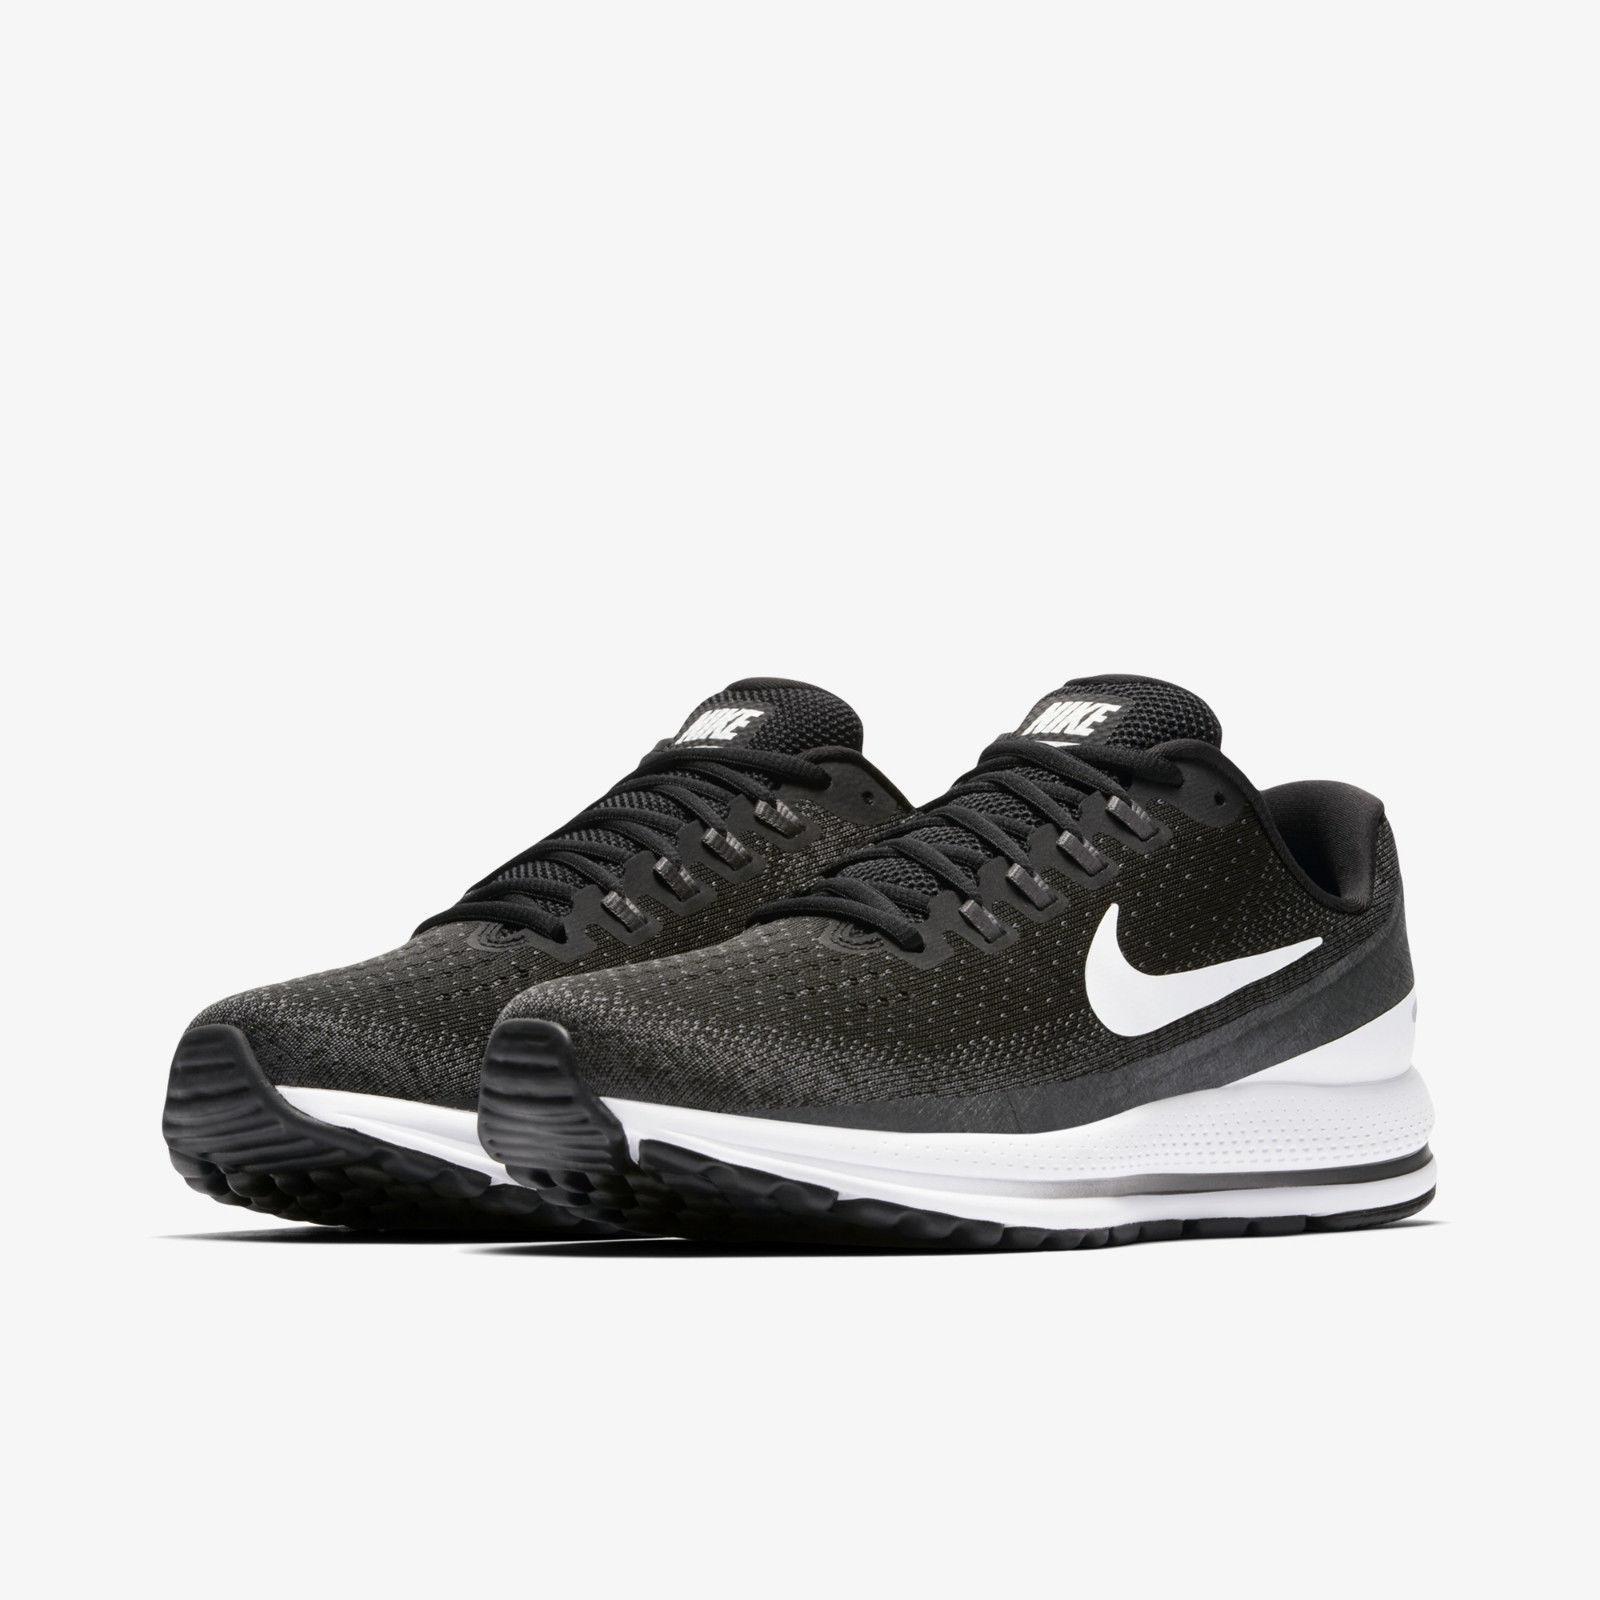 pretty nice 960f6 5fbf8 Nike Air Zoom Vomero 13 922908-001 and 43 similar items. 57